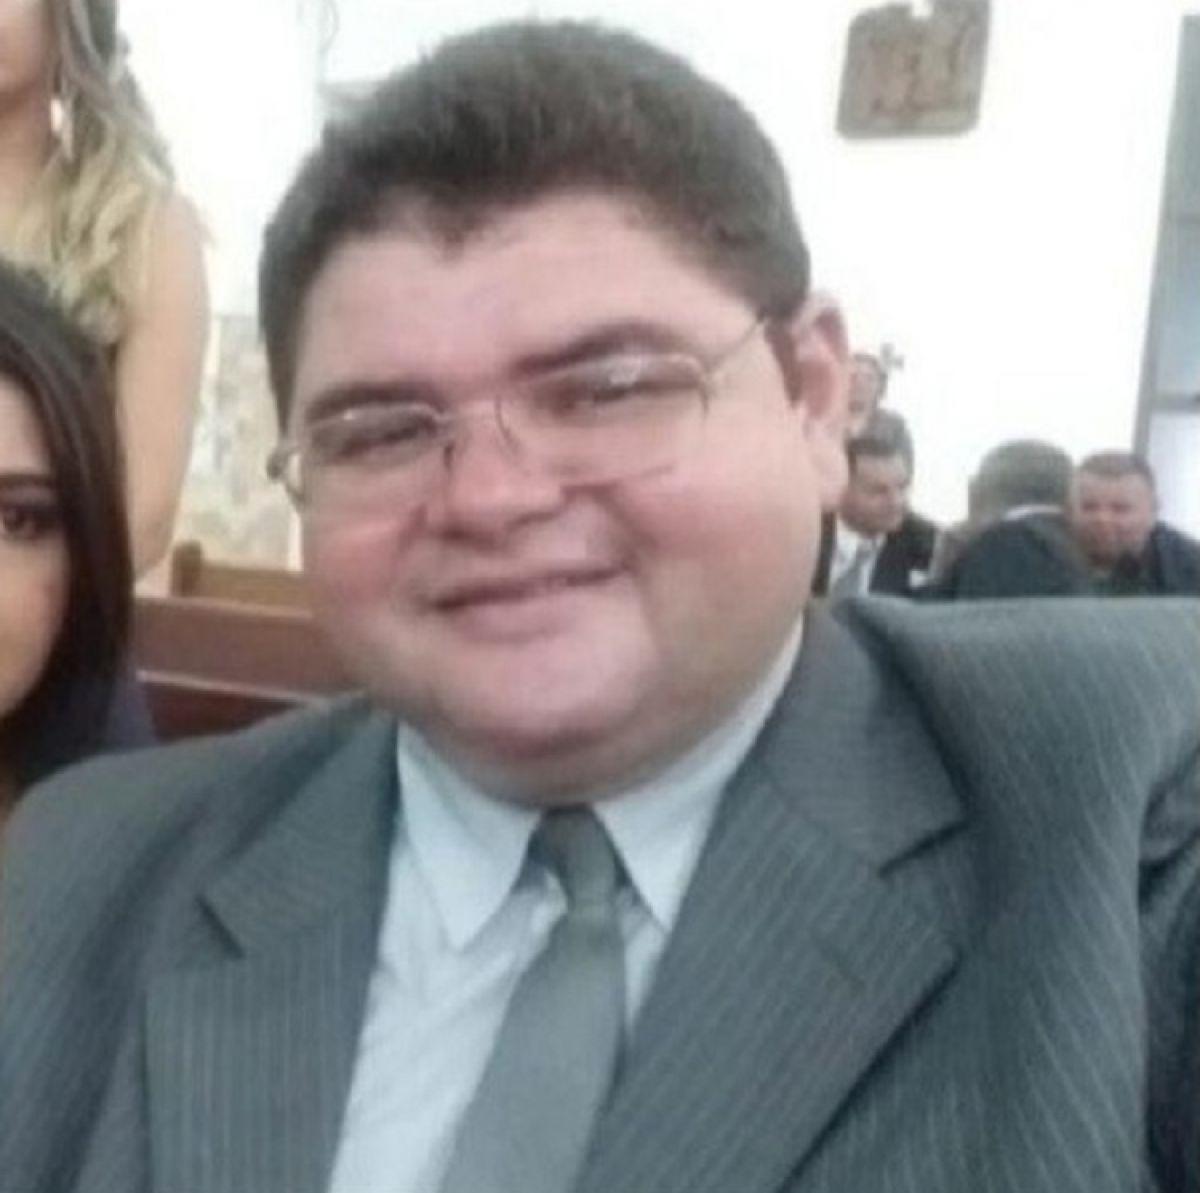 Jornalista Carlos Mesquita recebe alta da UTI